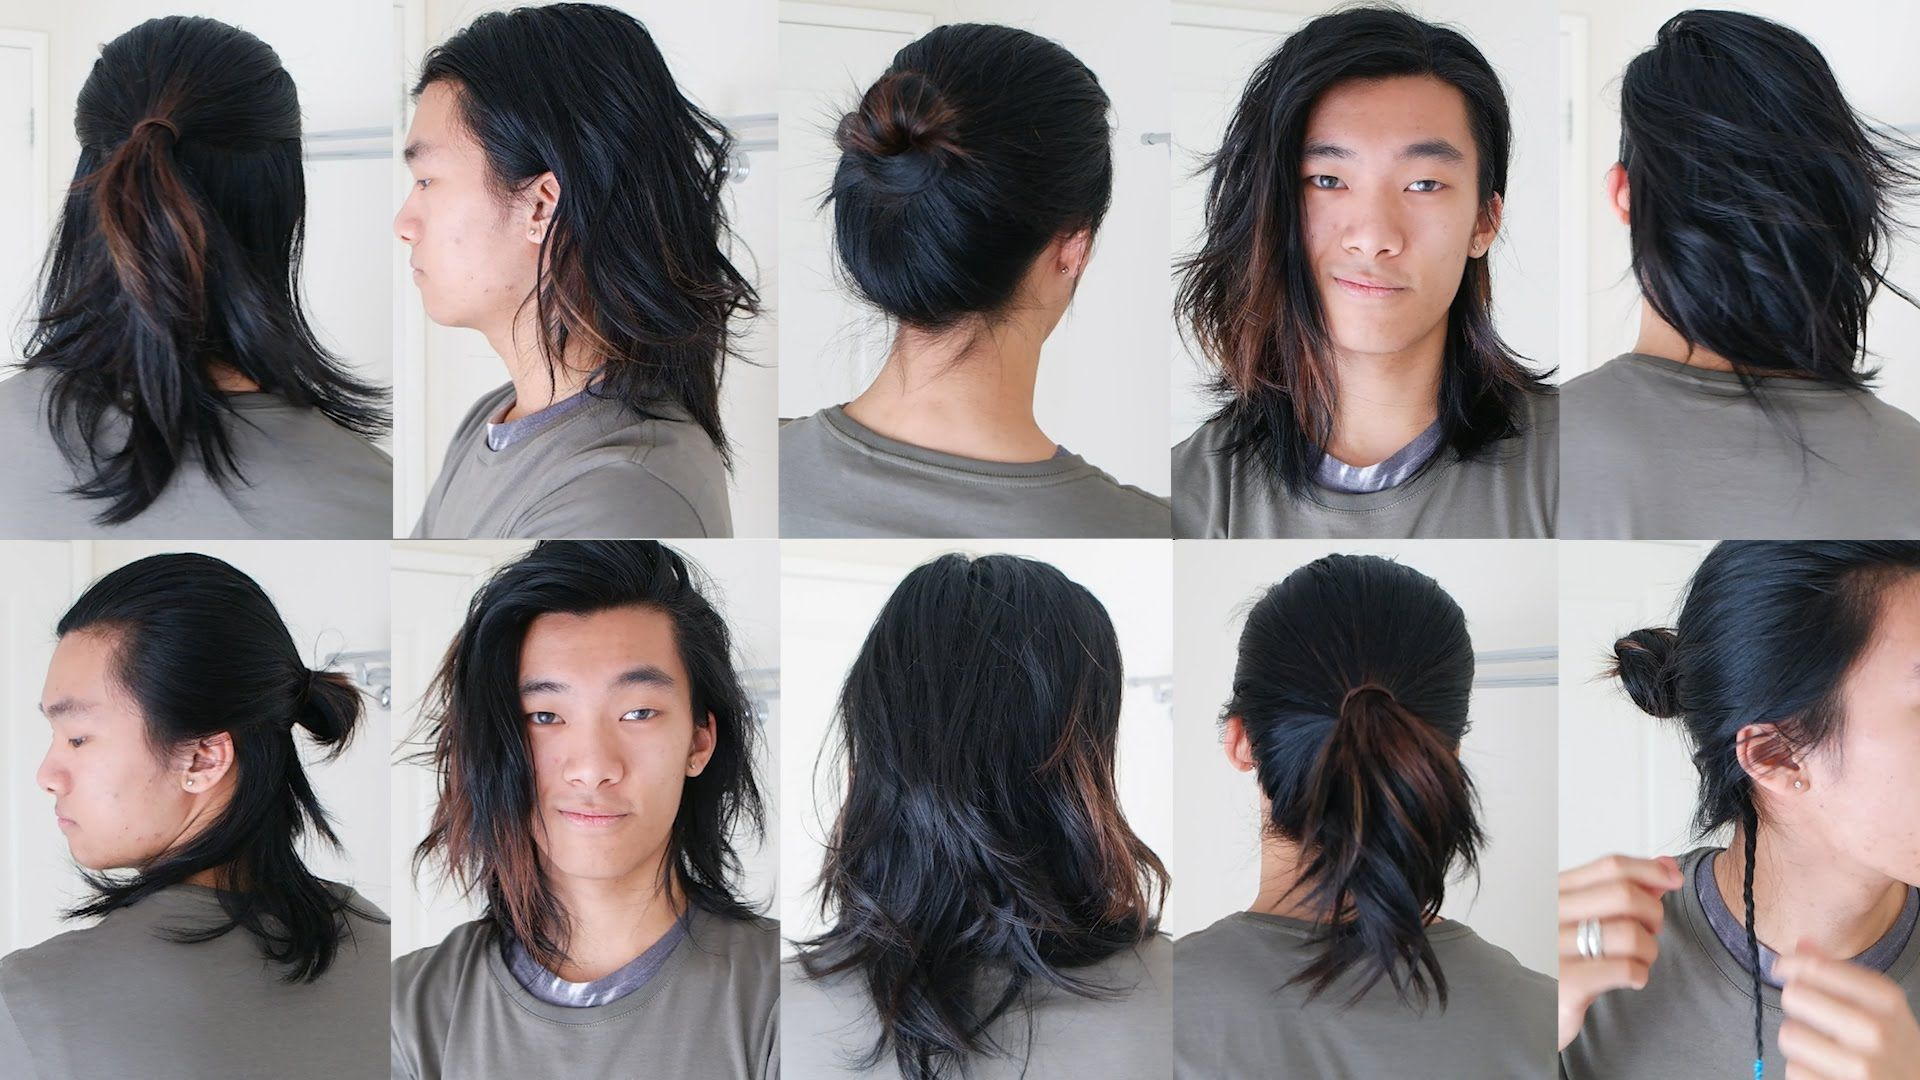 Men Long Hairstyles 10 Easy Long Hairstyles For Men  2016  Peinados  Pinterest